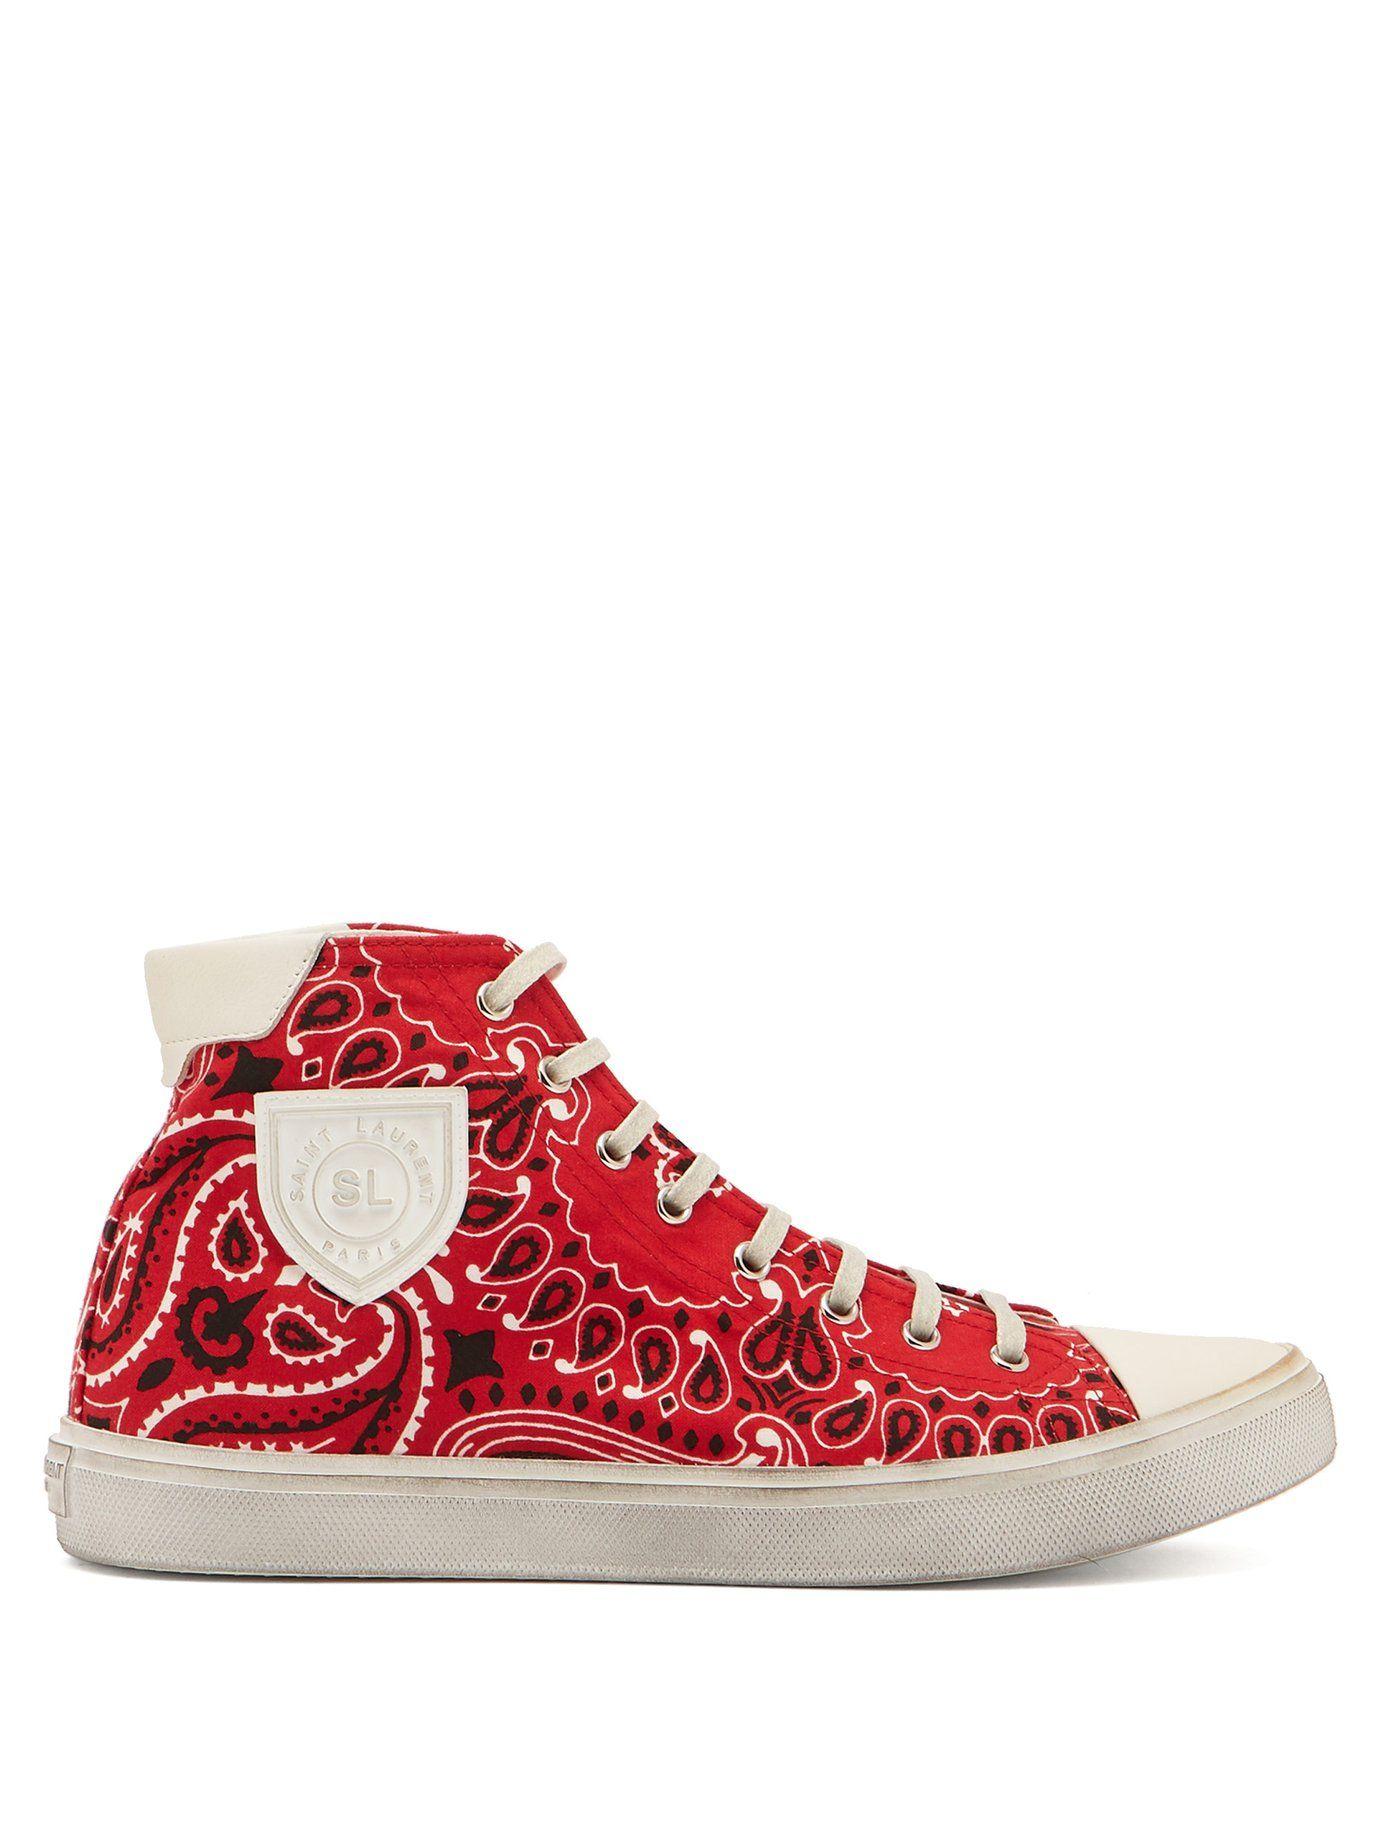 6cb853933512 GABRIELLE'S AMAZING FANTASY CLOSET | Bedford red bandana-print canvas  high-top trainers | Saint Laurent